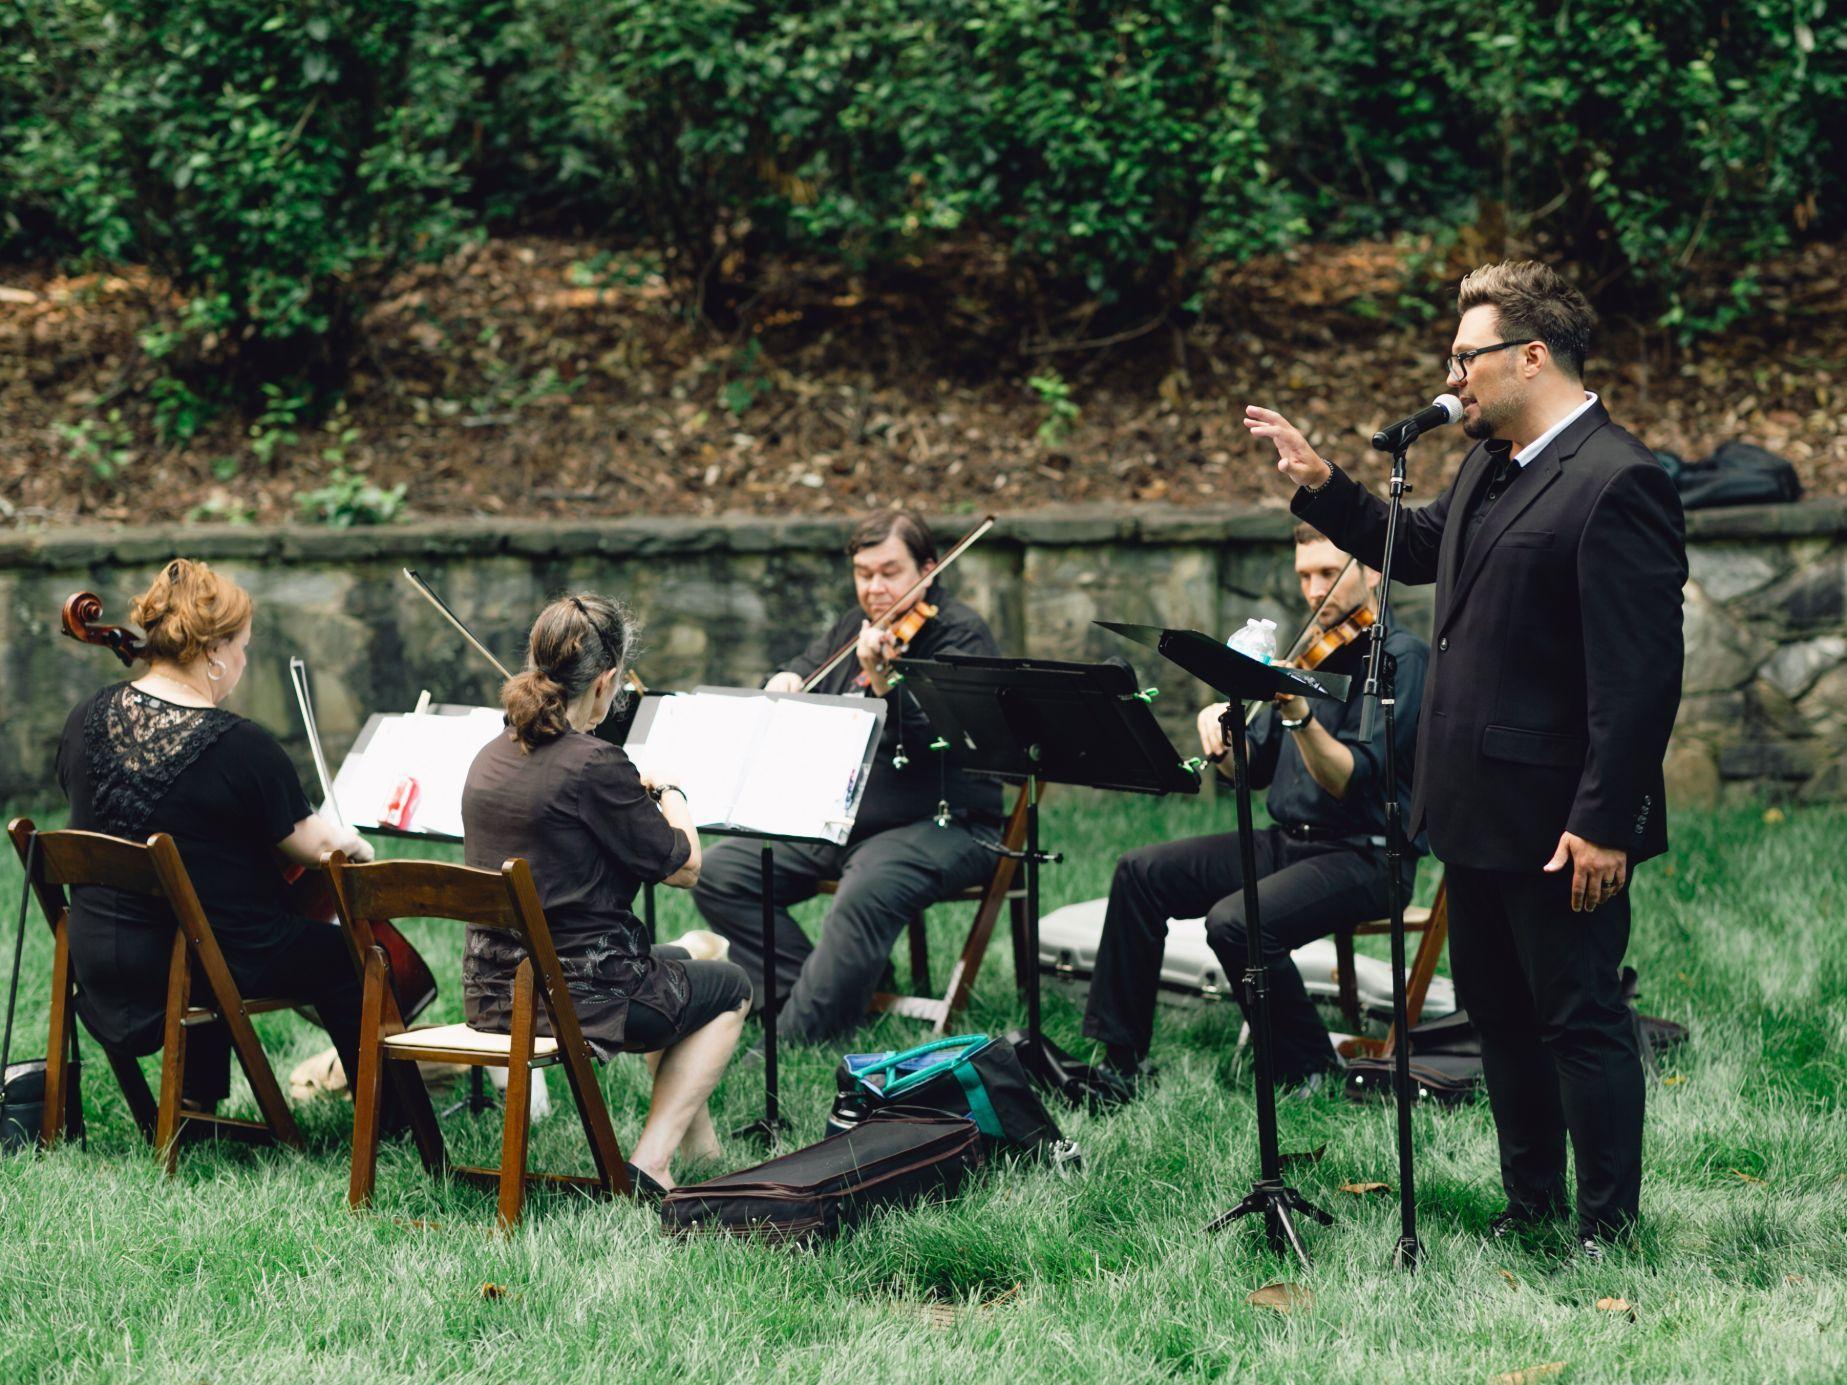 Ceremony Quartet at the Atlanta History Center!